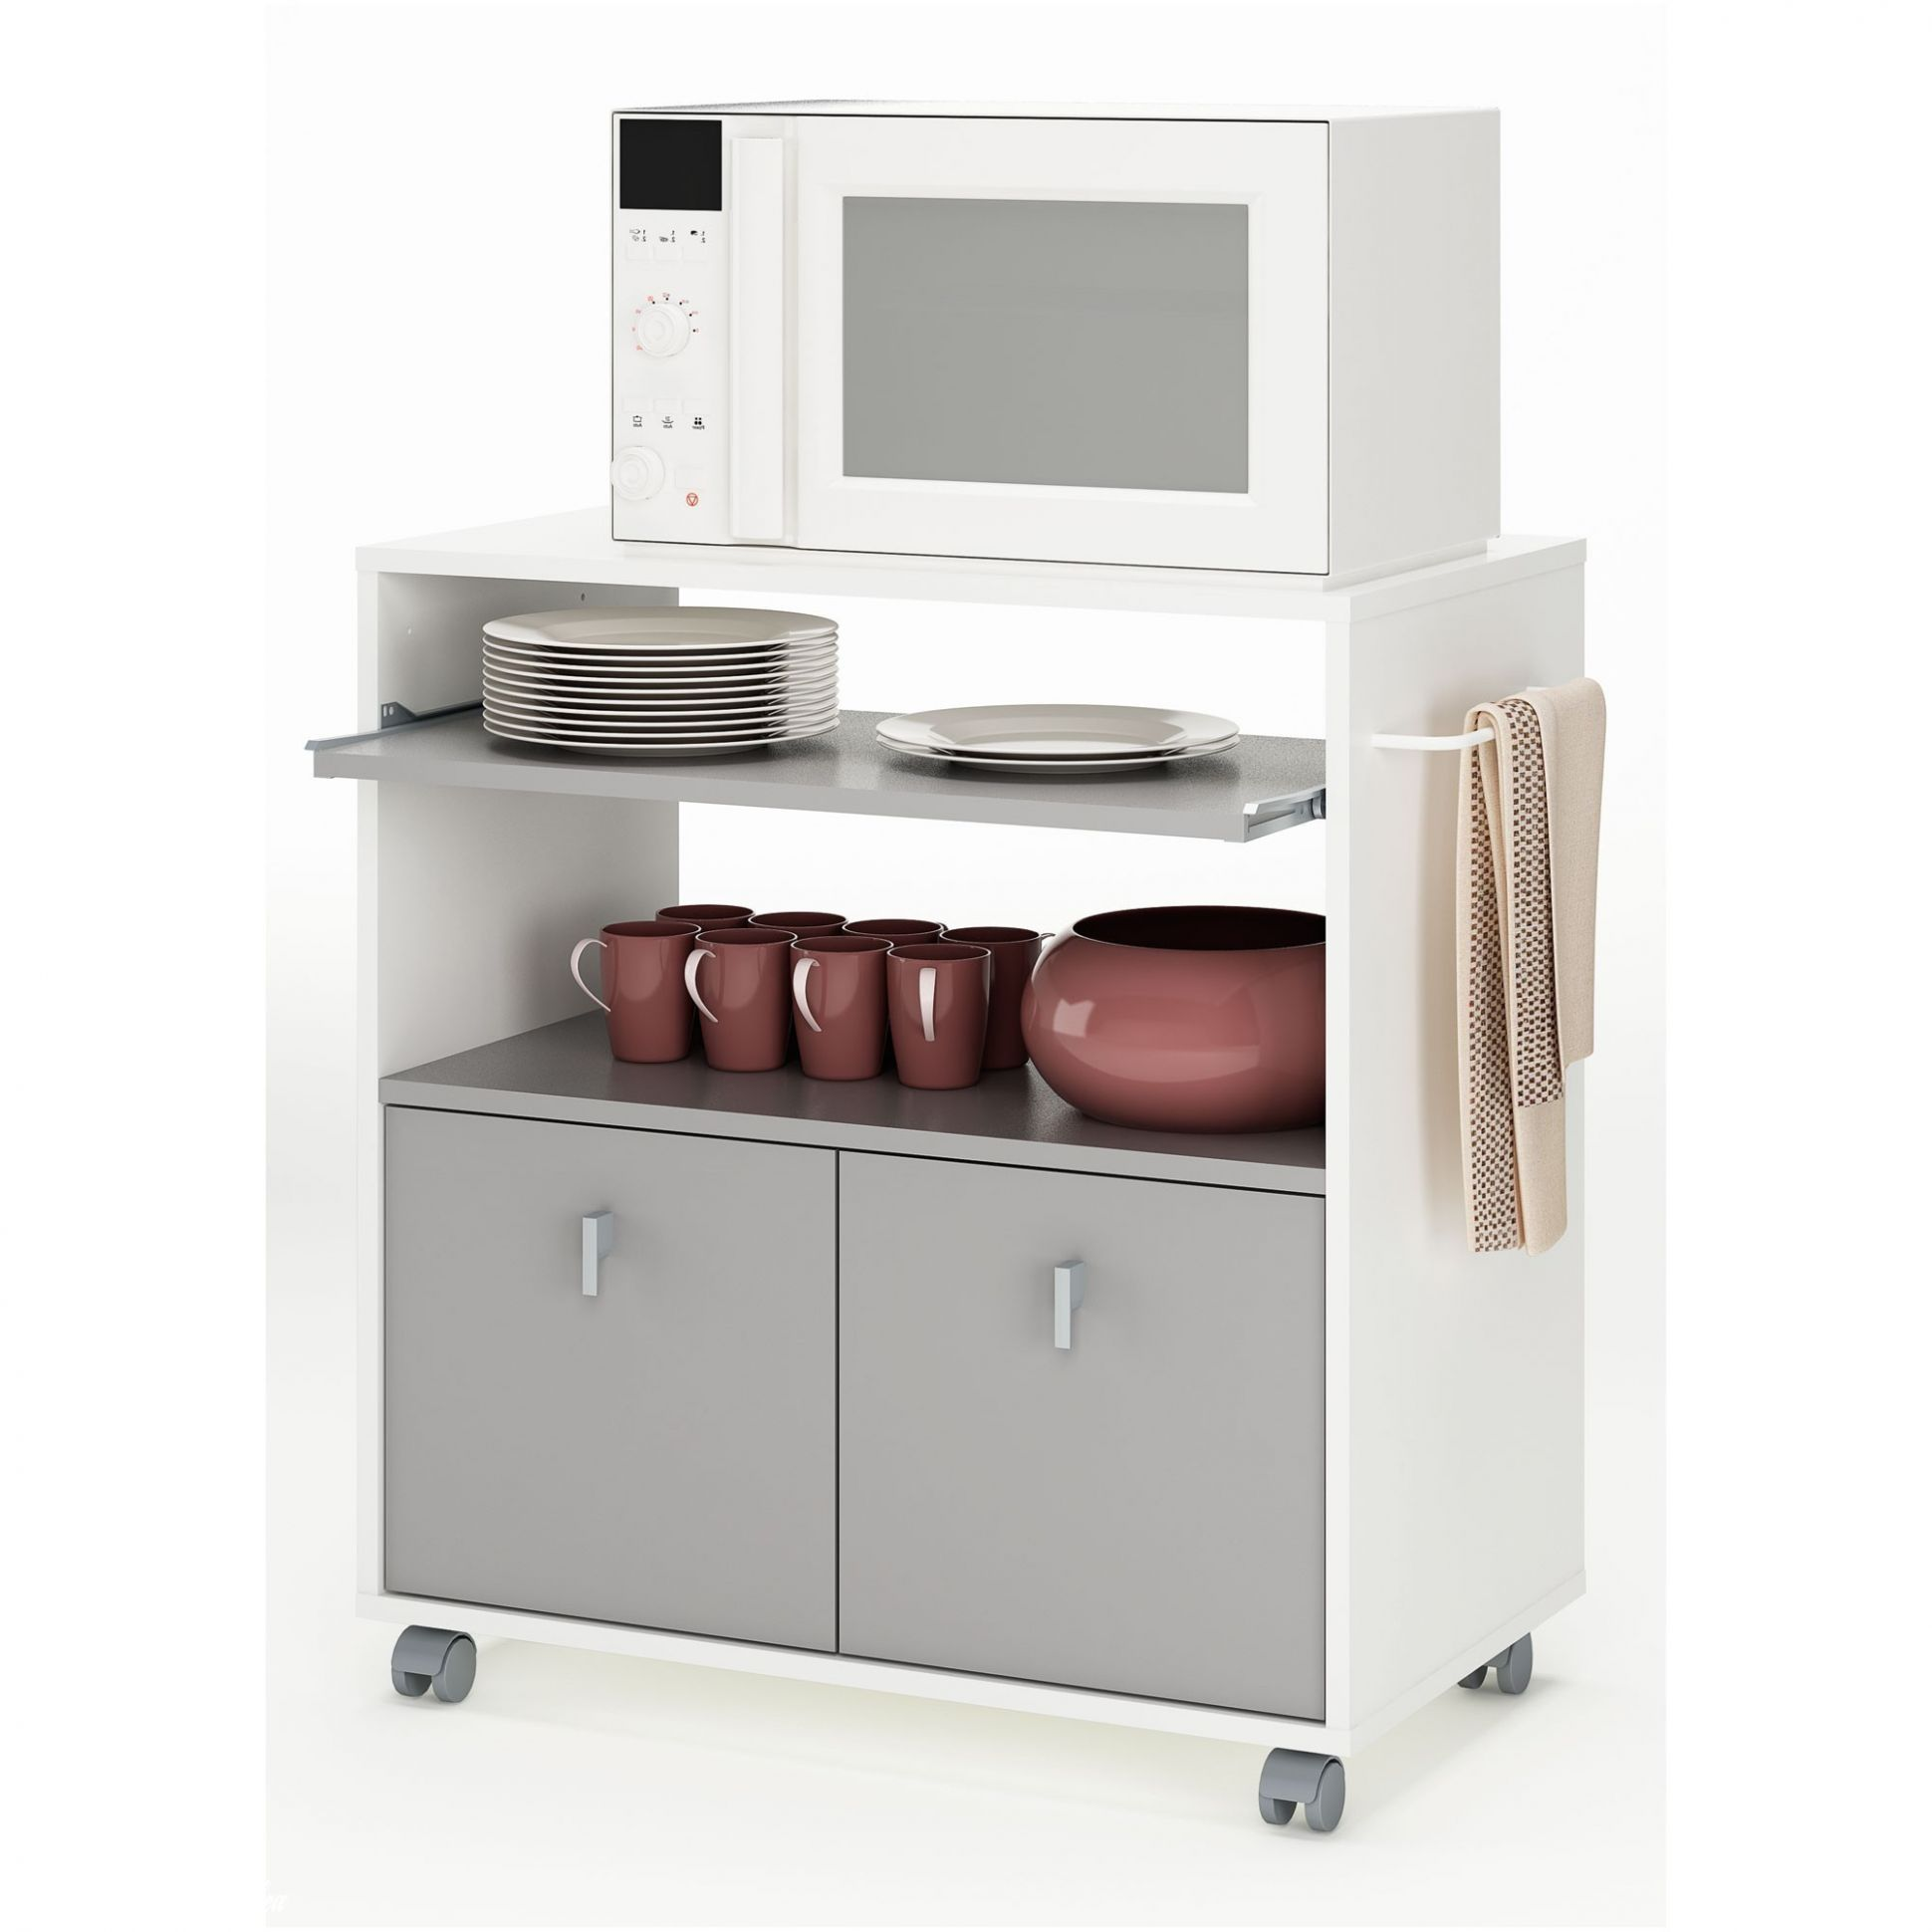 15 Meuble Micro Ondes Ikea in 15  Ikea, Kitchen appliances, Kitchen